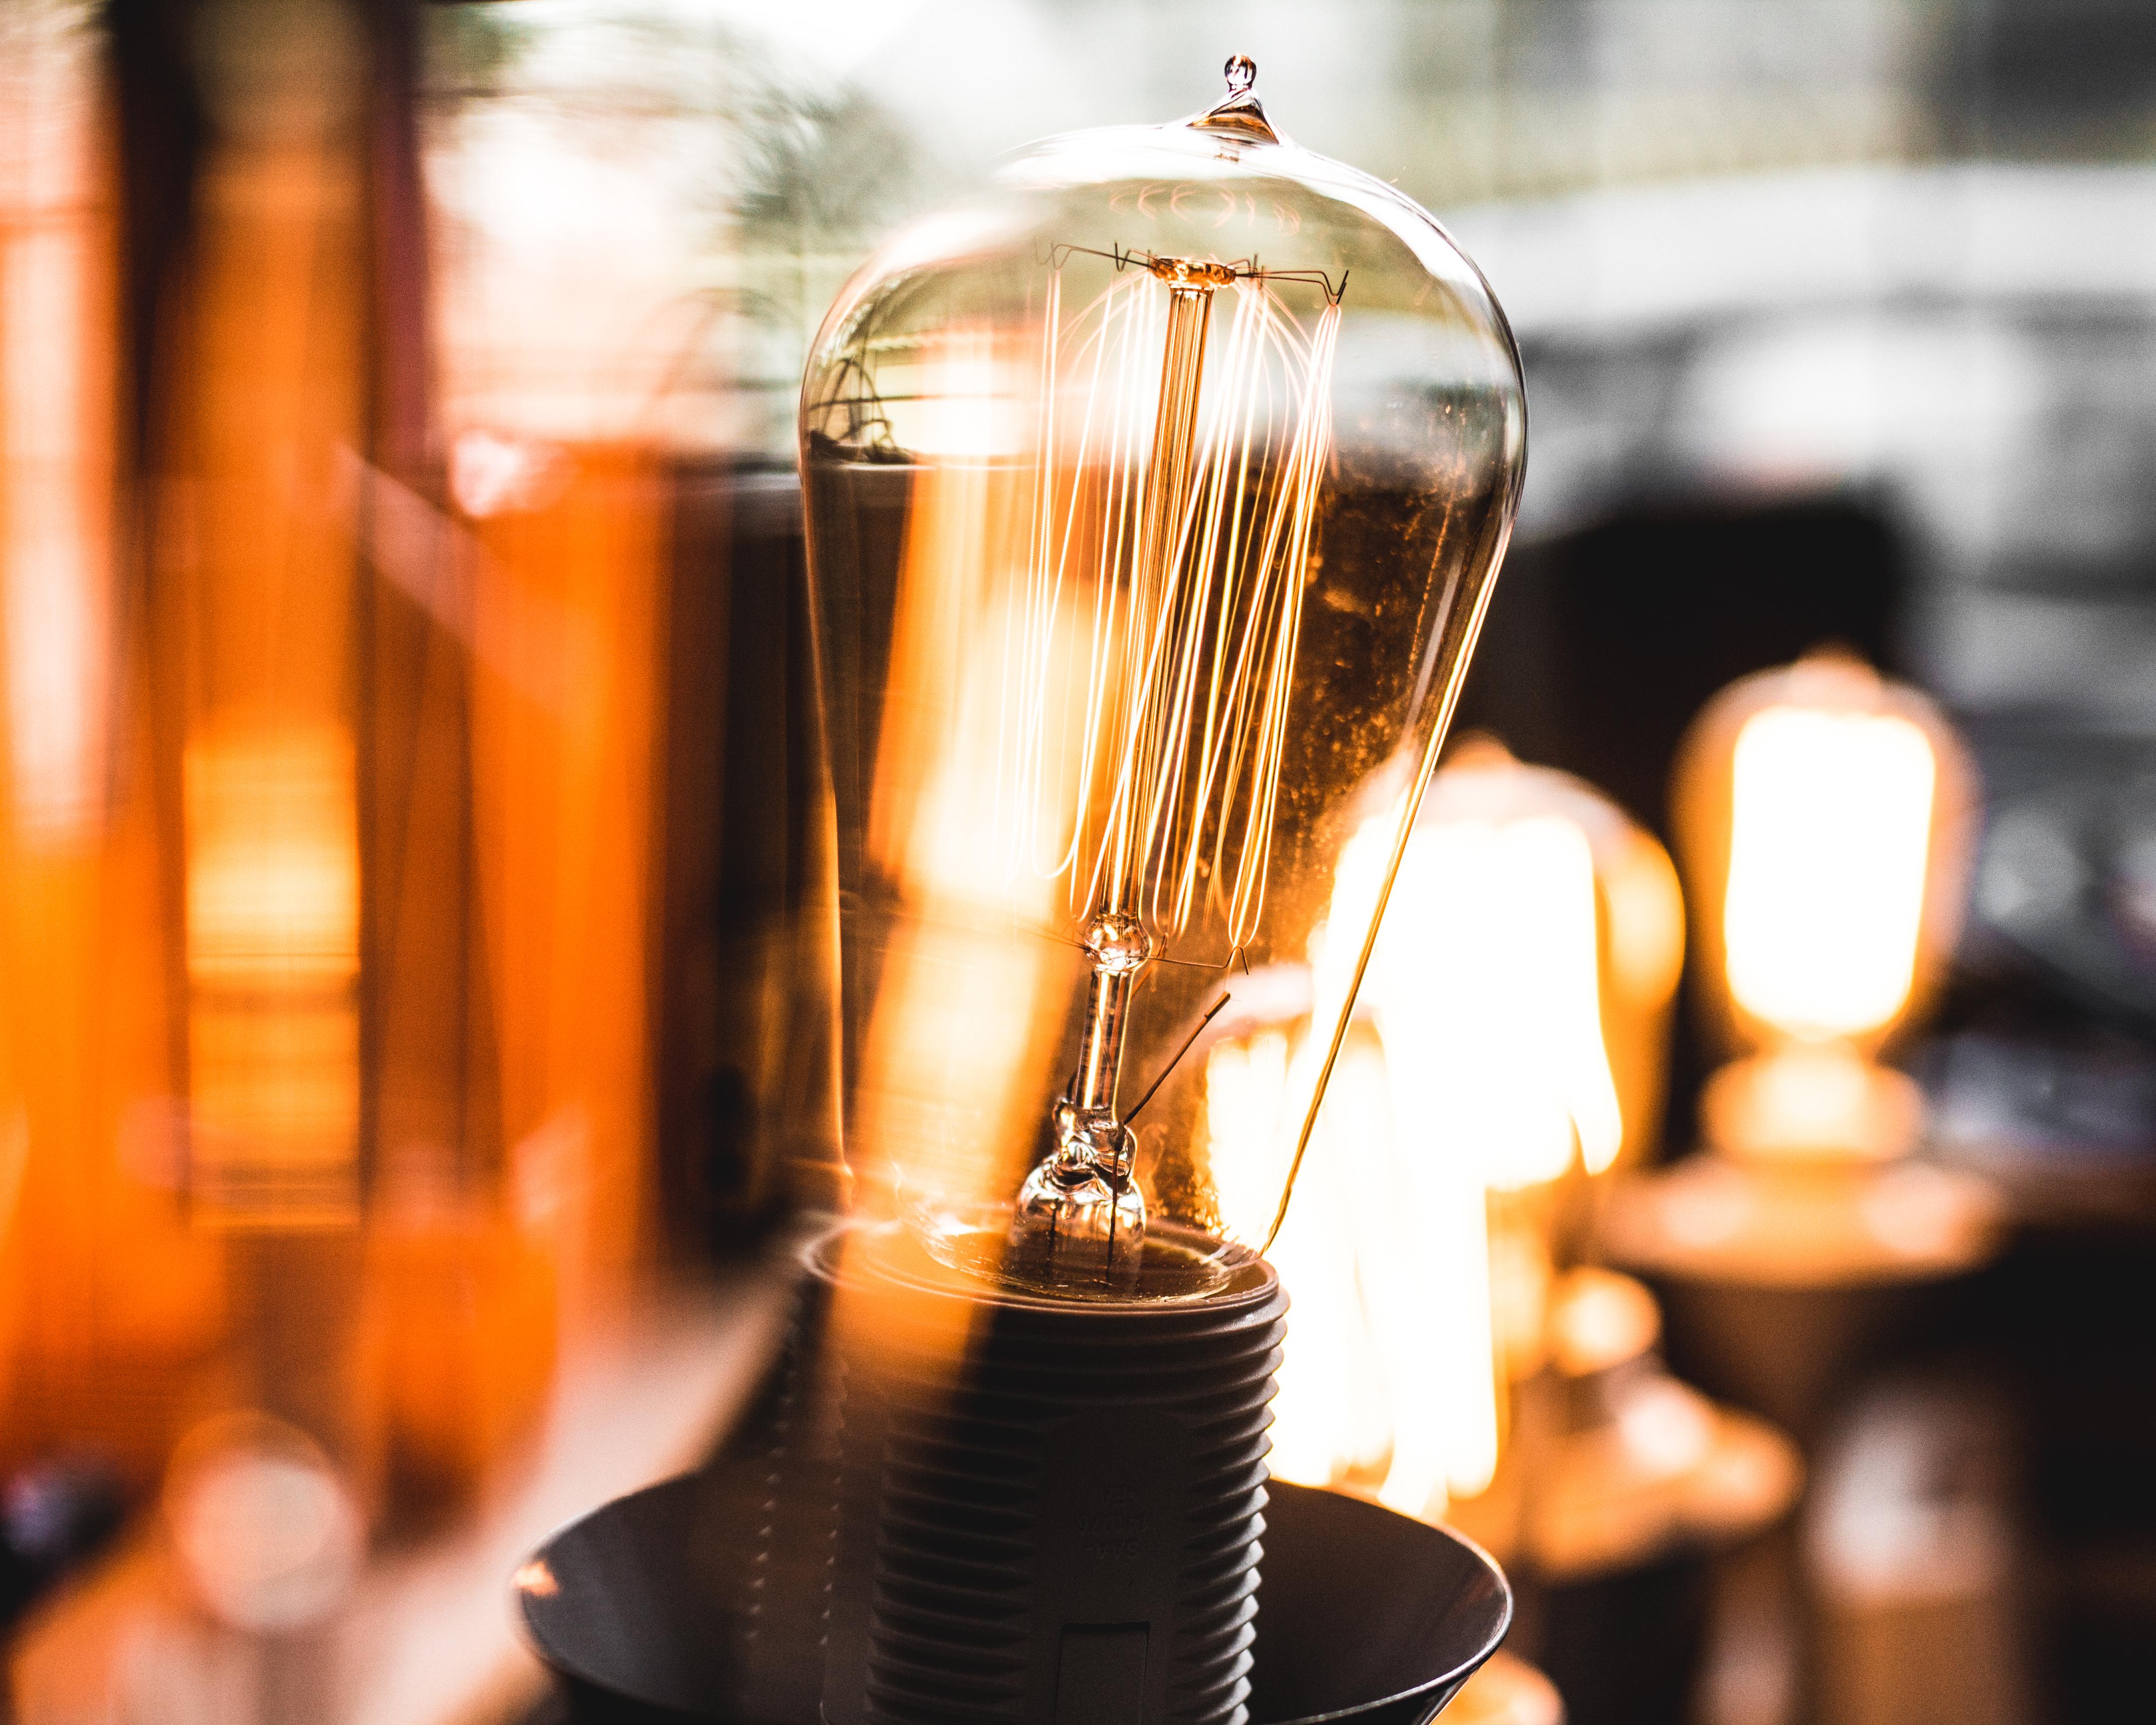 Light Bulb in Macro Shot Photography